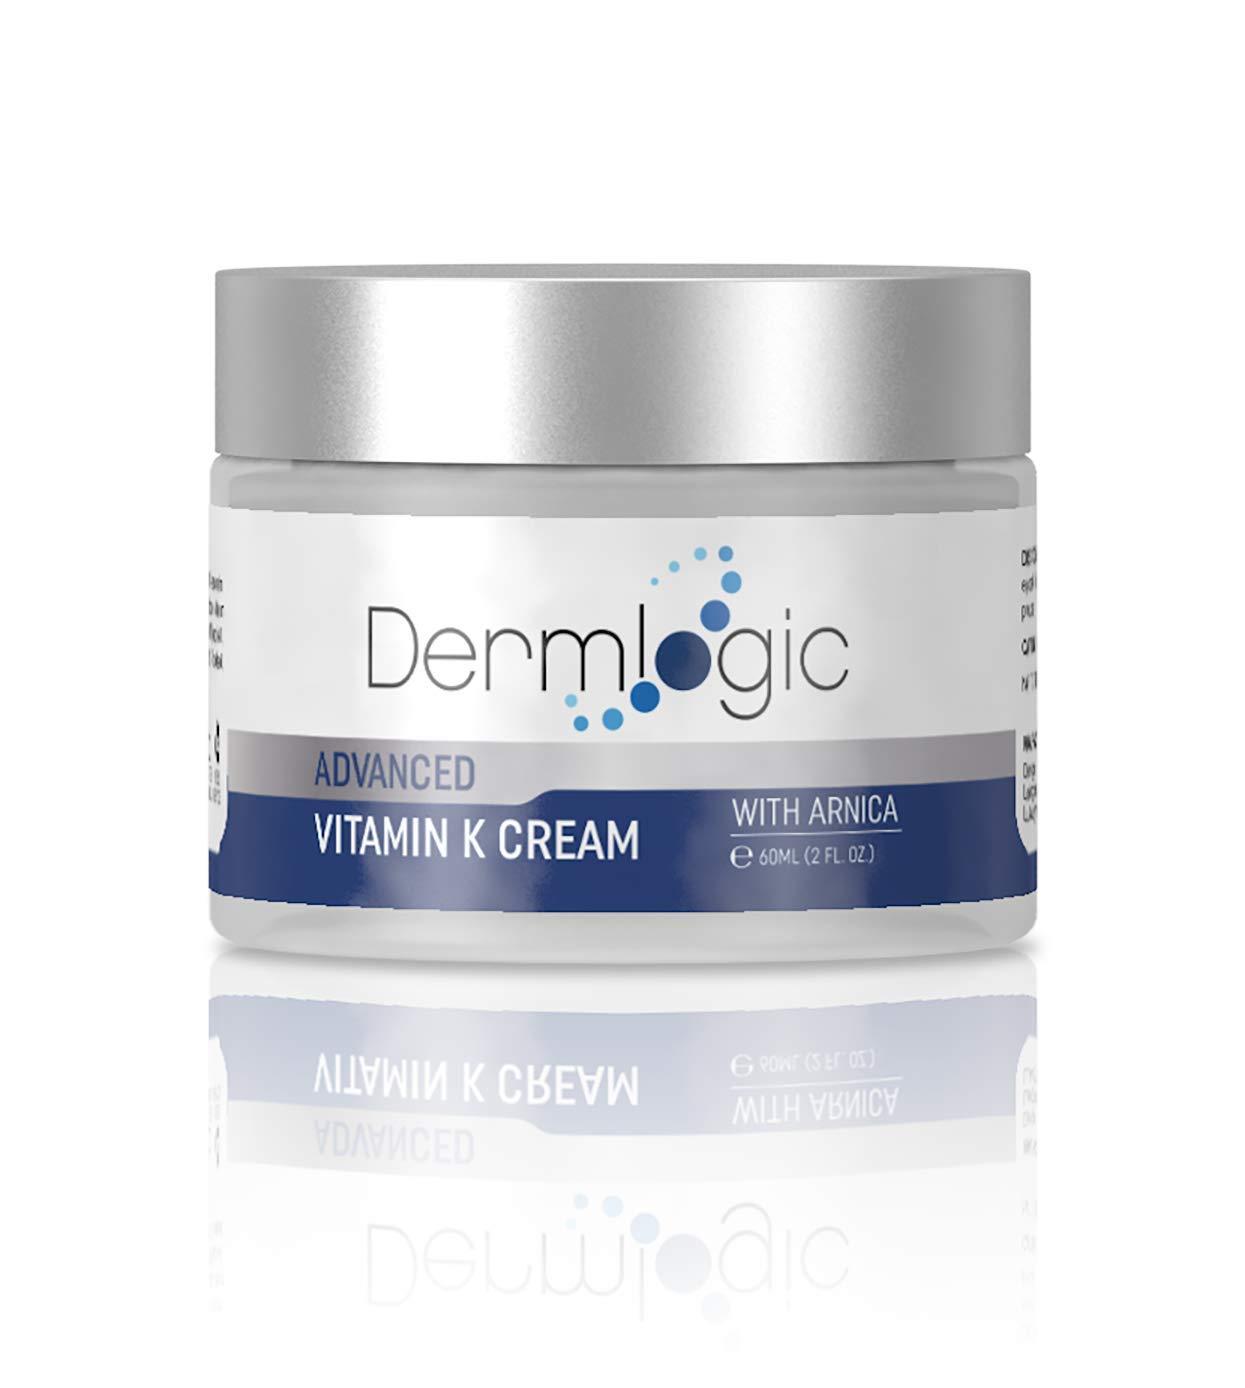 Vitamin K Cream- Moisturizing Bruise Healing Formula. Dark Spot Corrector for Bruising, Spider Veins & Broken Capillaries. Reduces Under Eye Dark Circles, Fine Lines, Puffiness, Wrinkles with Arnica by Dermlogic